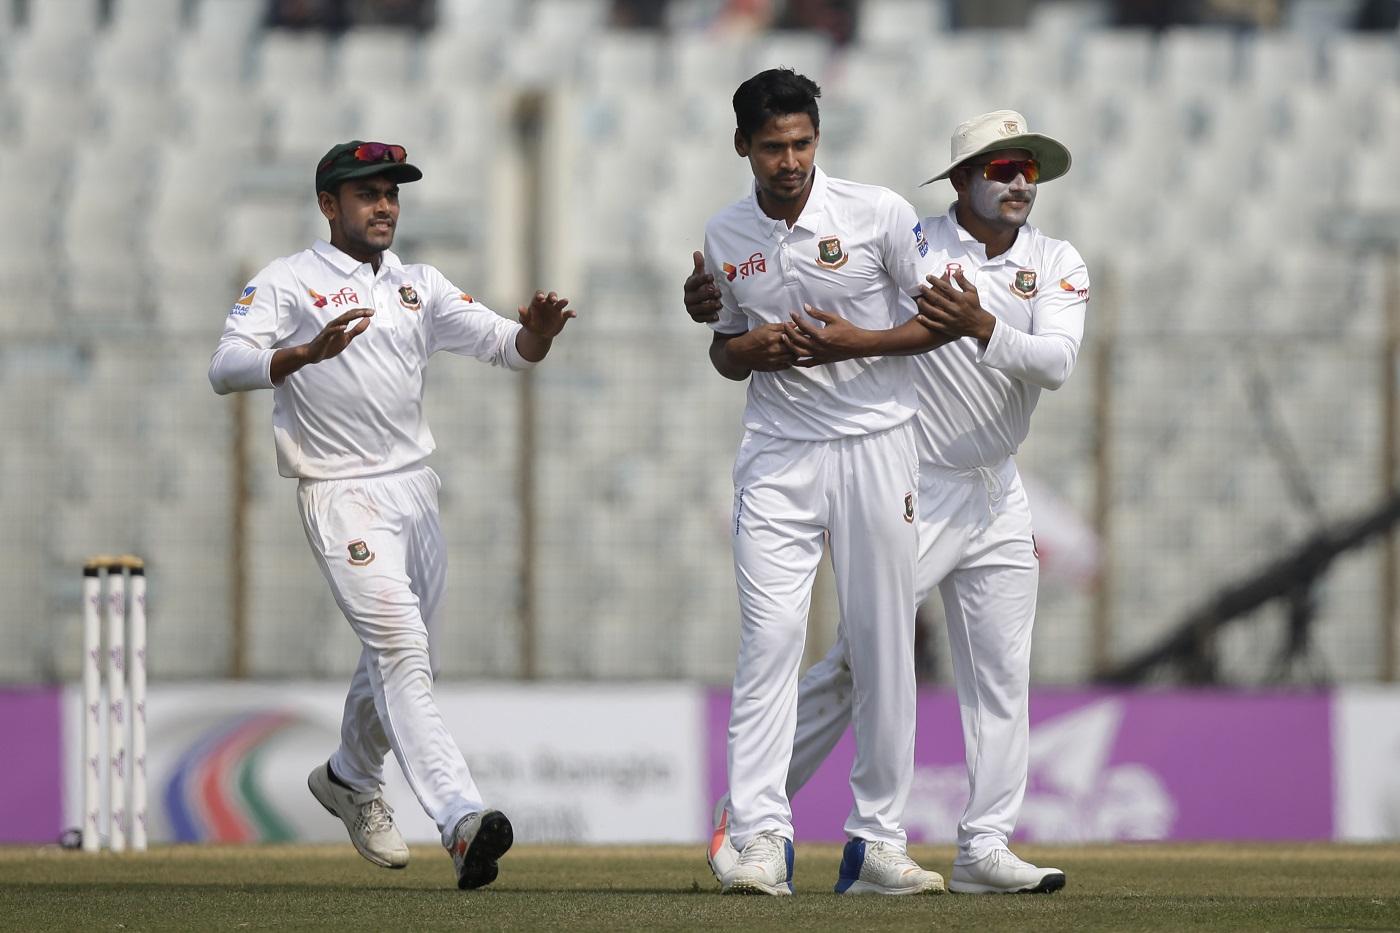 Bangladesh's Mustafizur Rahman, center, celebrate with his teammates Imrul Kayes, and Mehidy Hasan